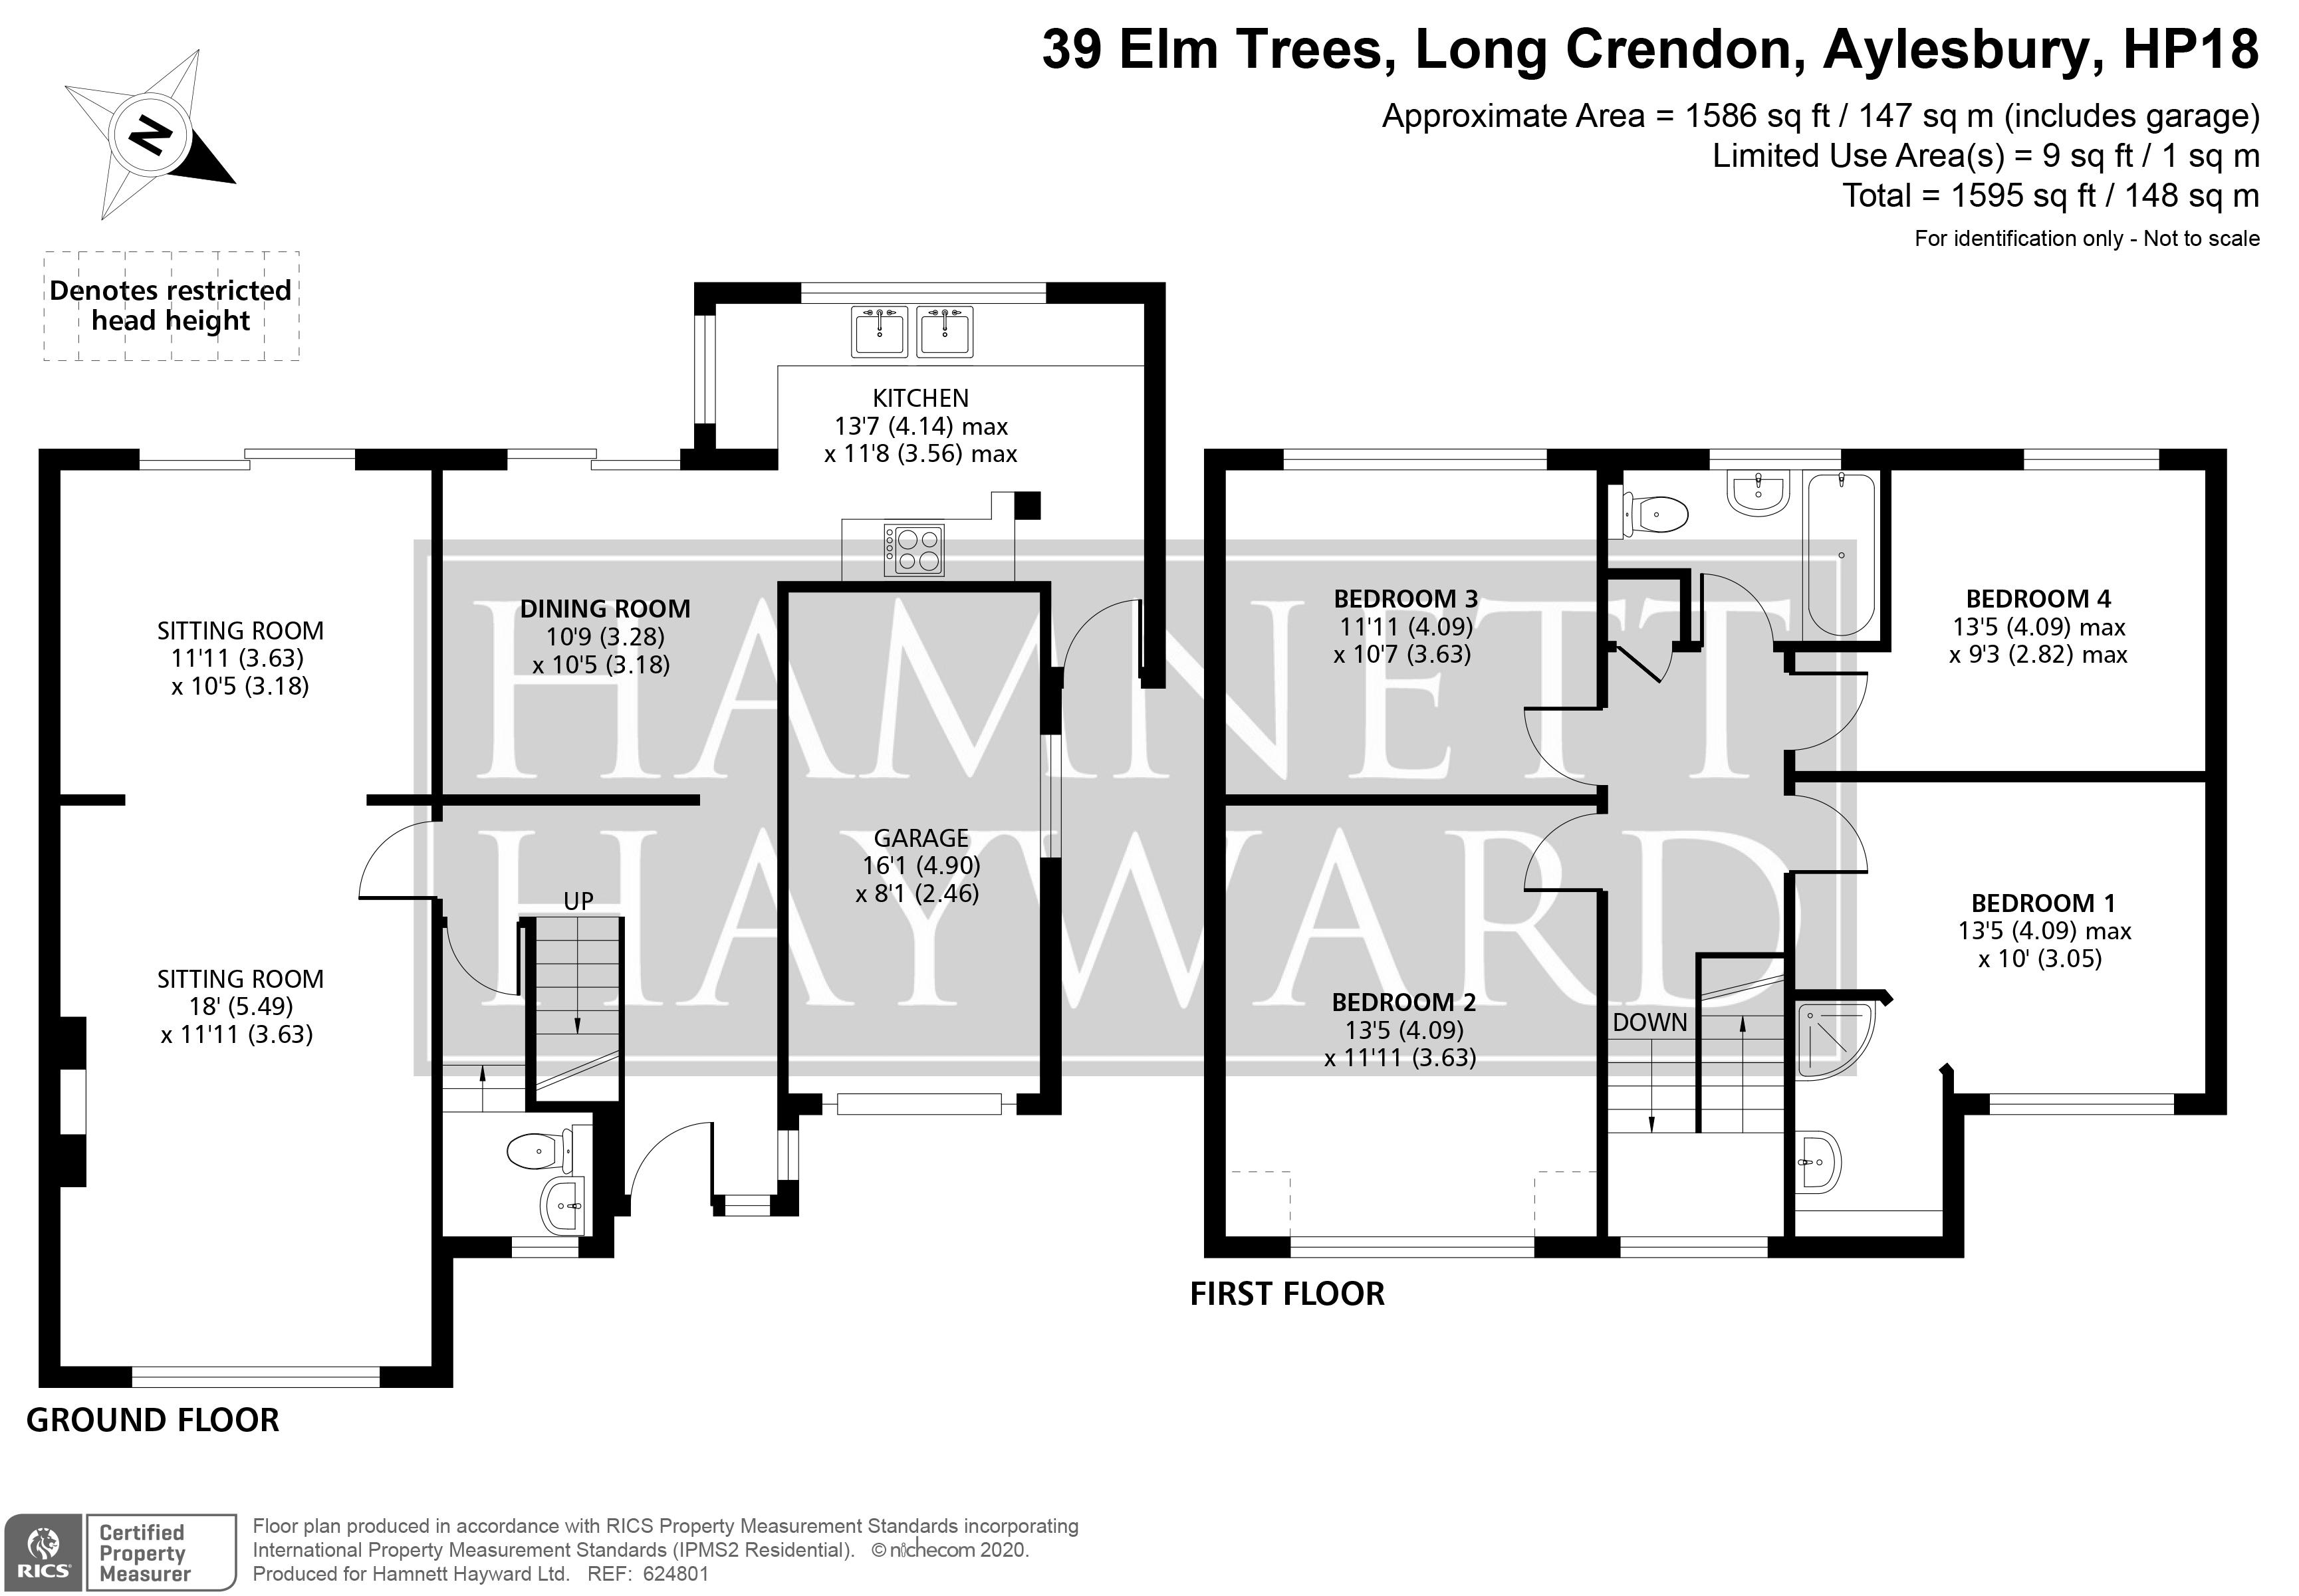 Elm Trees Long Crendon